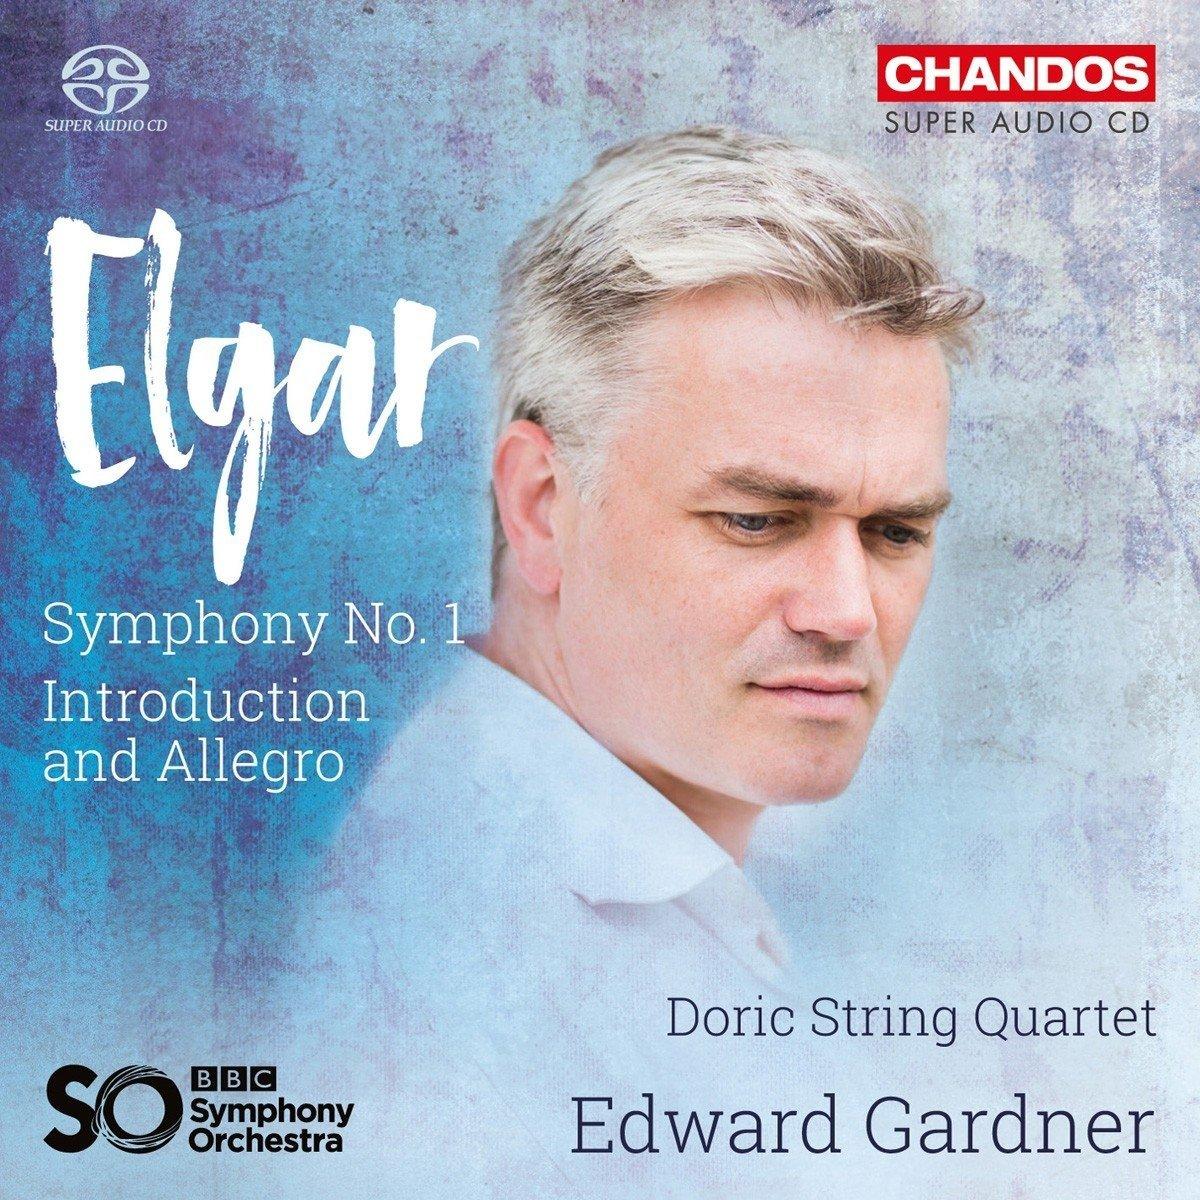 Elgar: Symphony No 1. - Edward Gardner